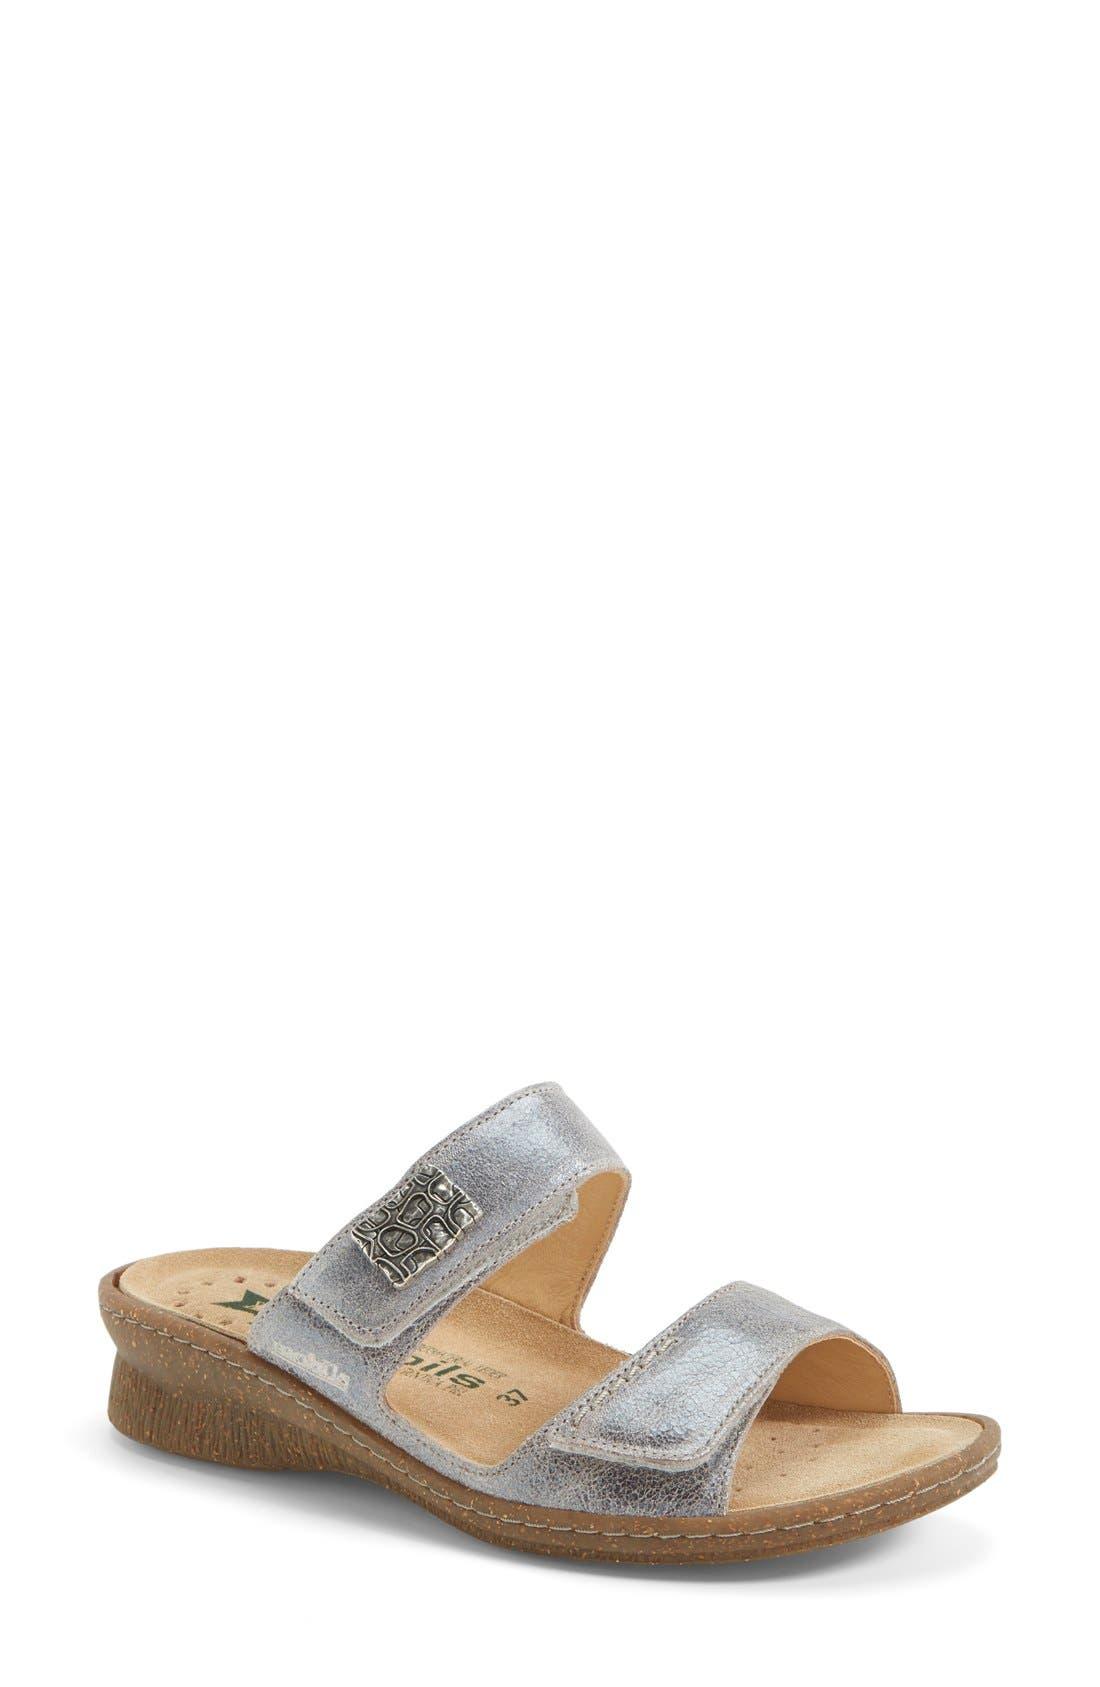 Alternate Image 1 Selected - Mephisto 'Bregalia' Metallic Leather Sandal (Women)